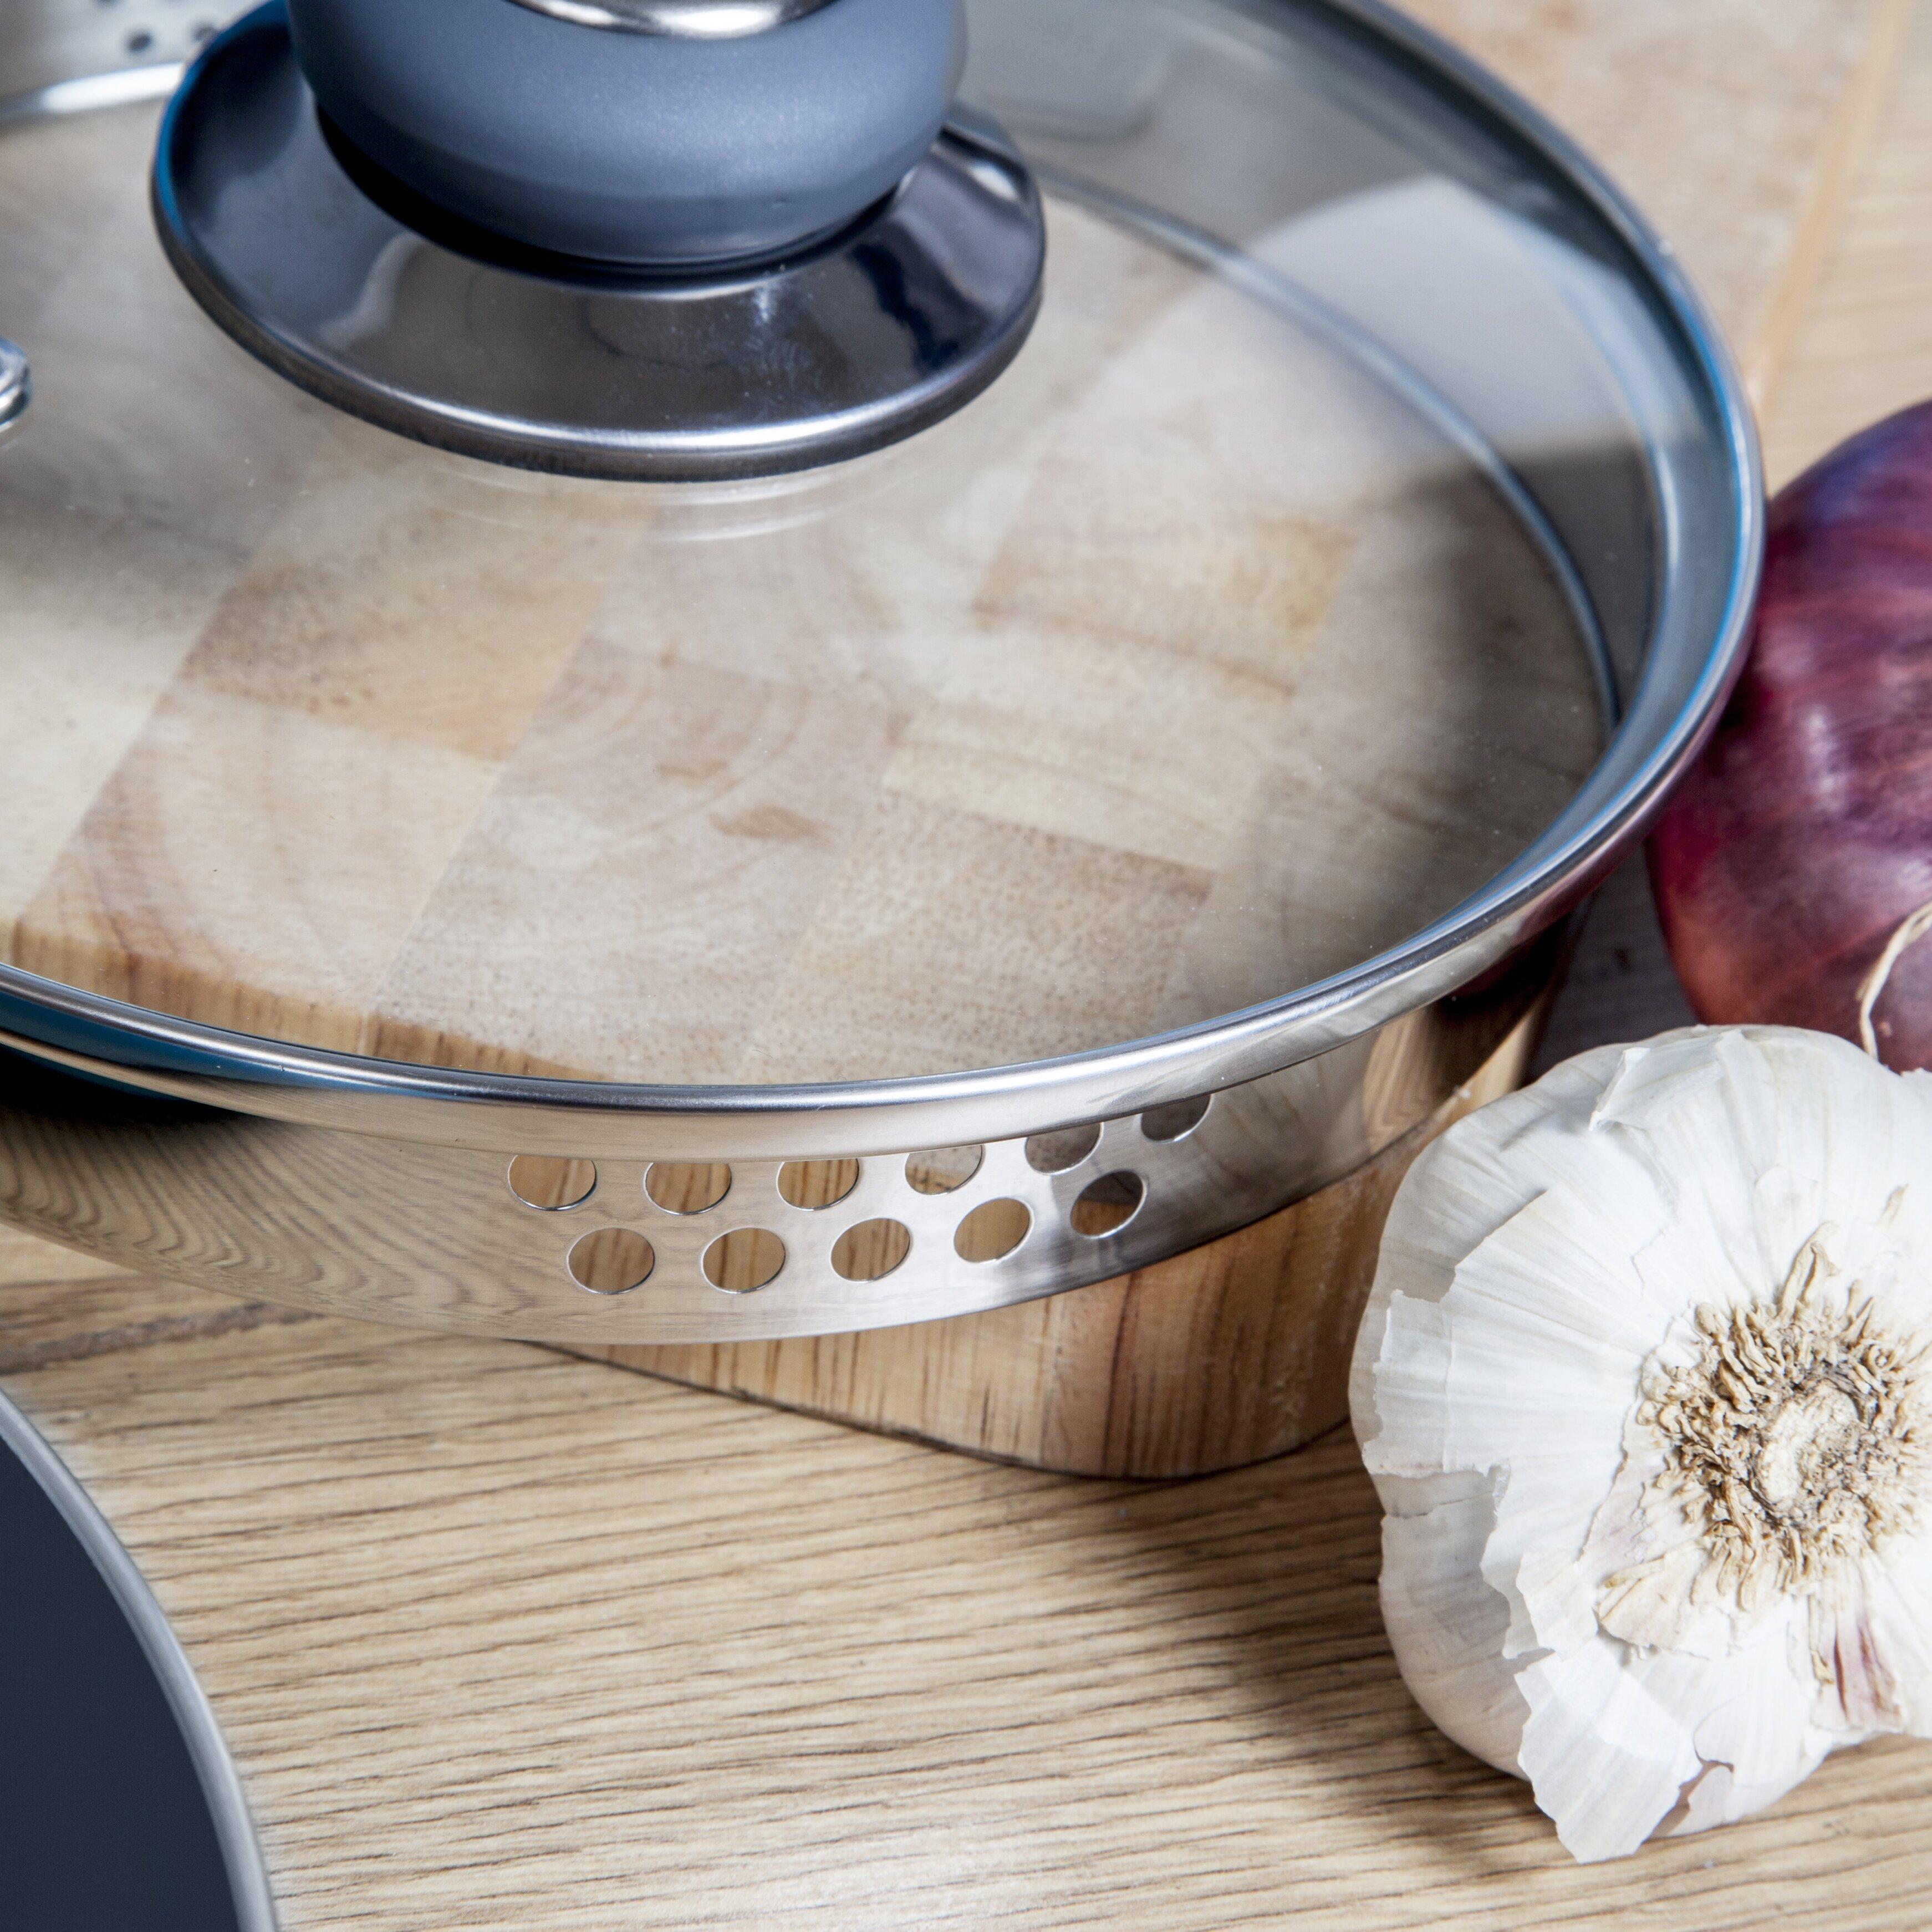 Morphy Richards Pots And Pans: Morphy Richards 5-Piece Non-Stick Pouring Cookware Set